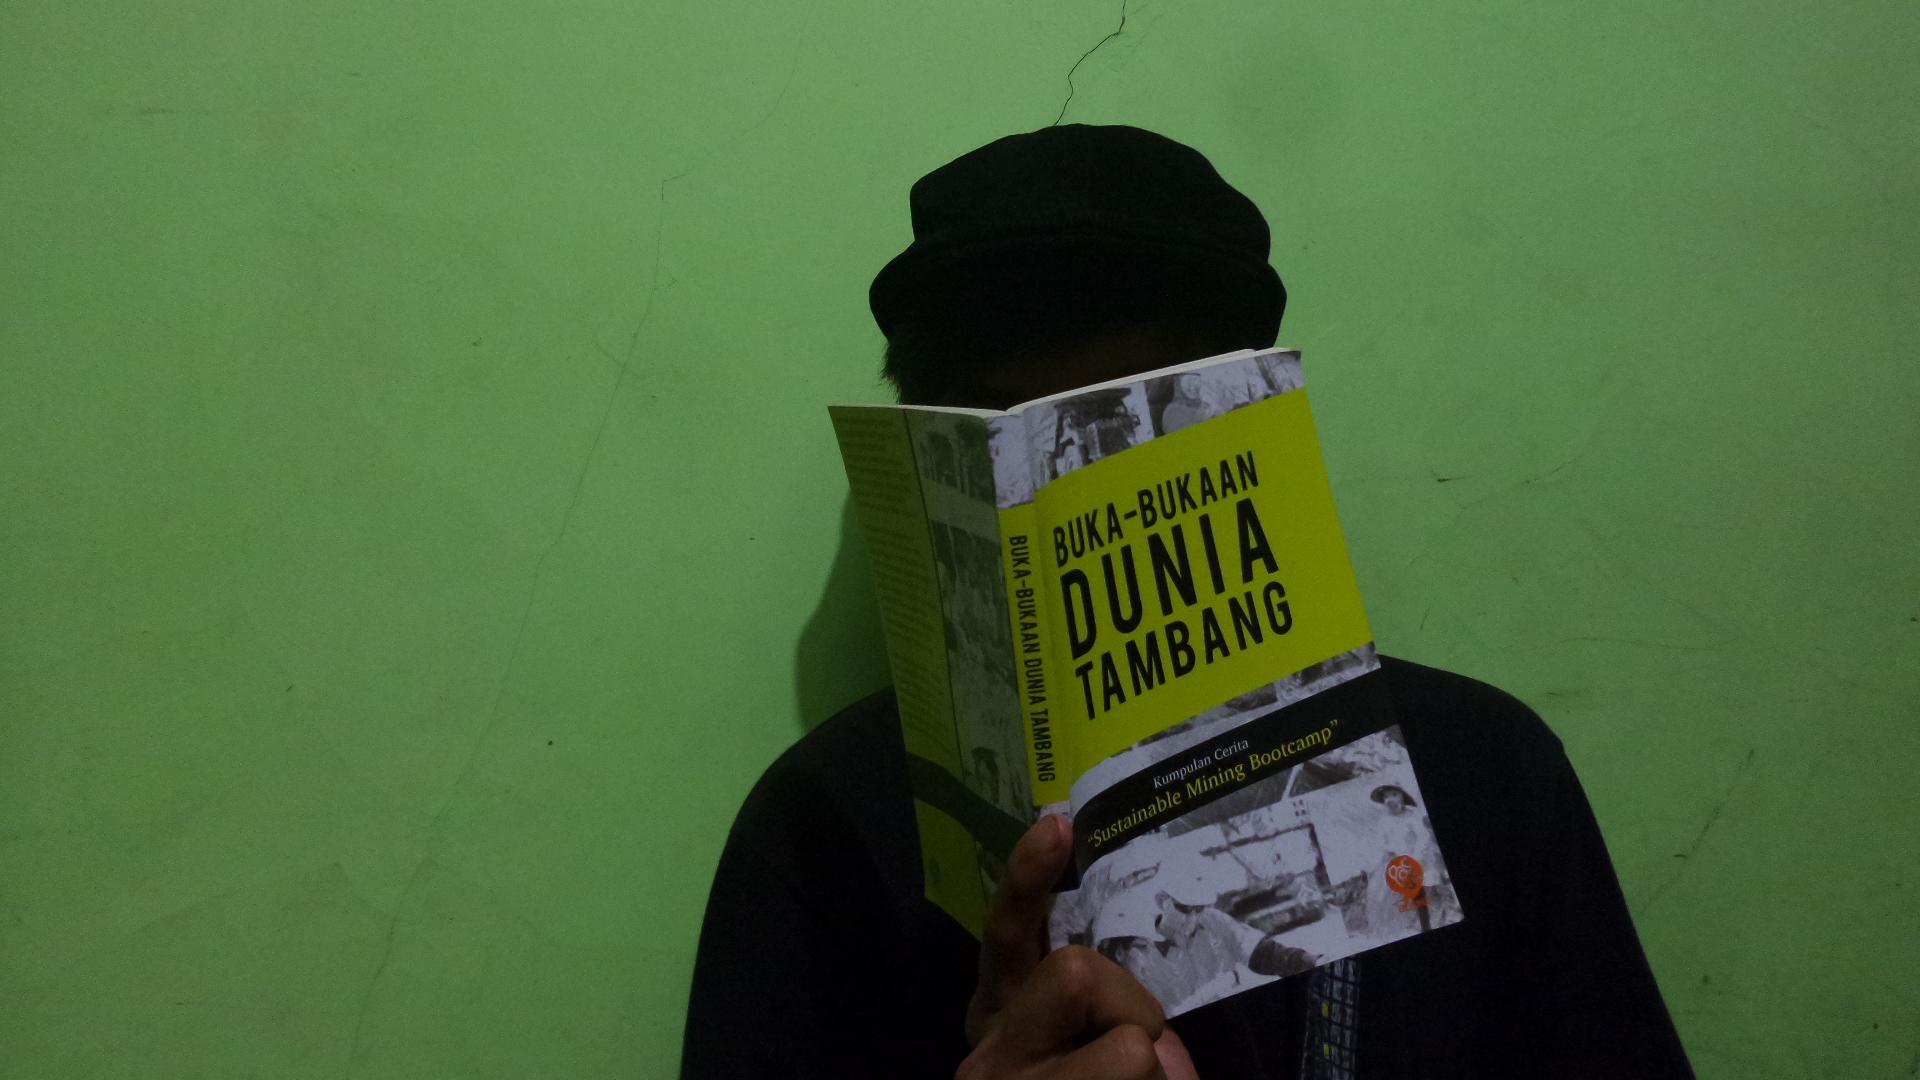 Buku Buka-Bukaan Dunia Tambang dari Pastel Books